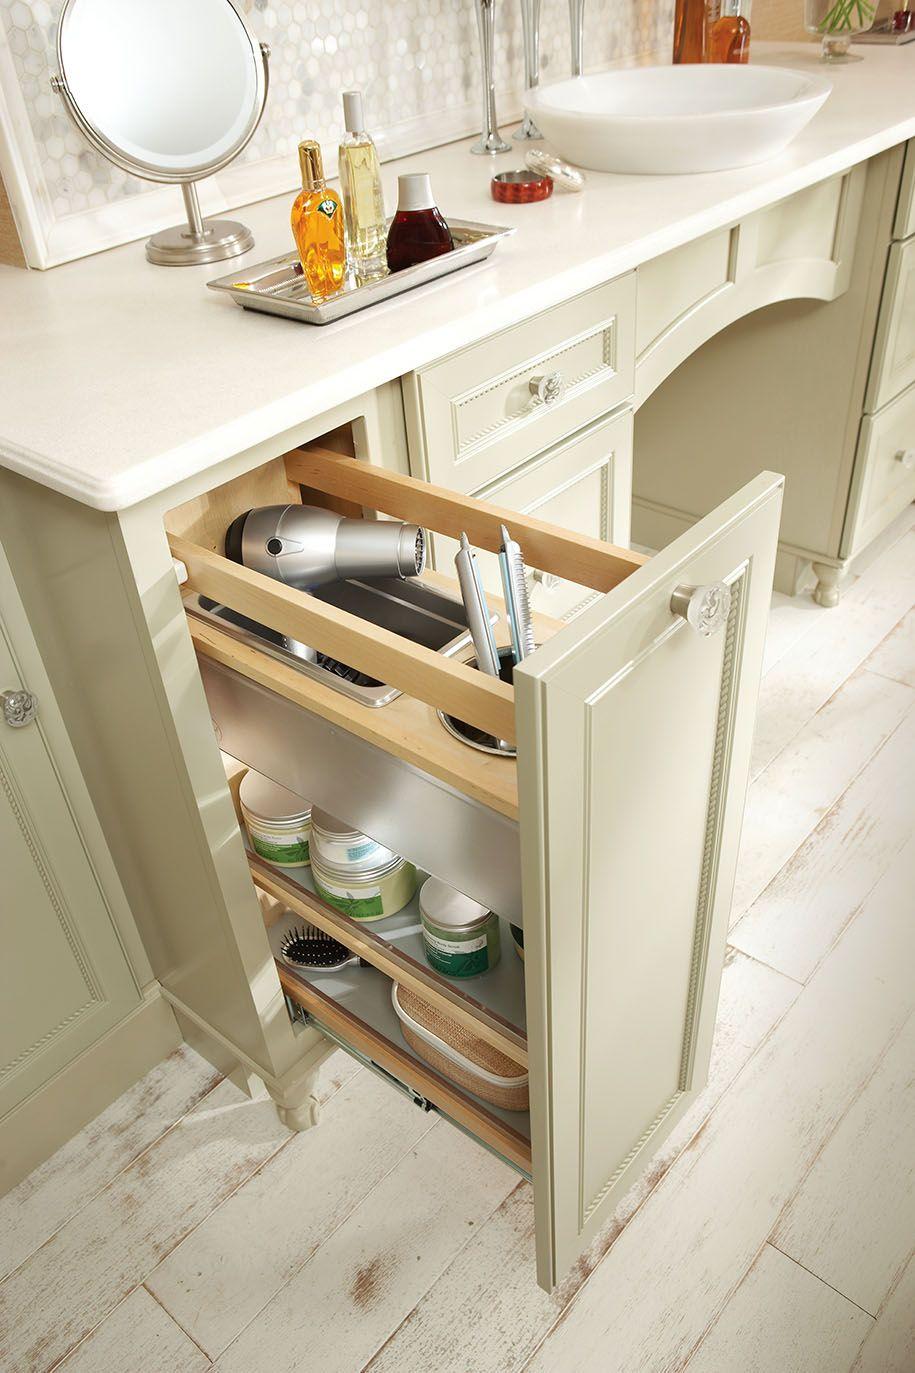 Merillat Masterpiece Base Vanity Pantry Pull Out Clever Bathroom Storage Kitchen Cabinet Accessories Bathroom Storage [ 1373 x 915 Pixel ]